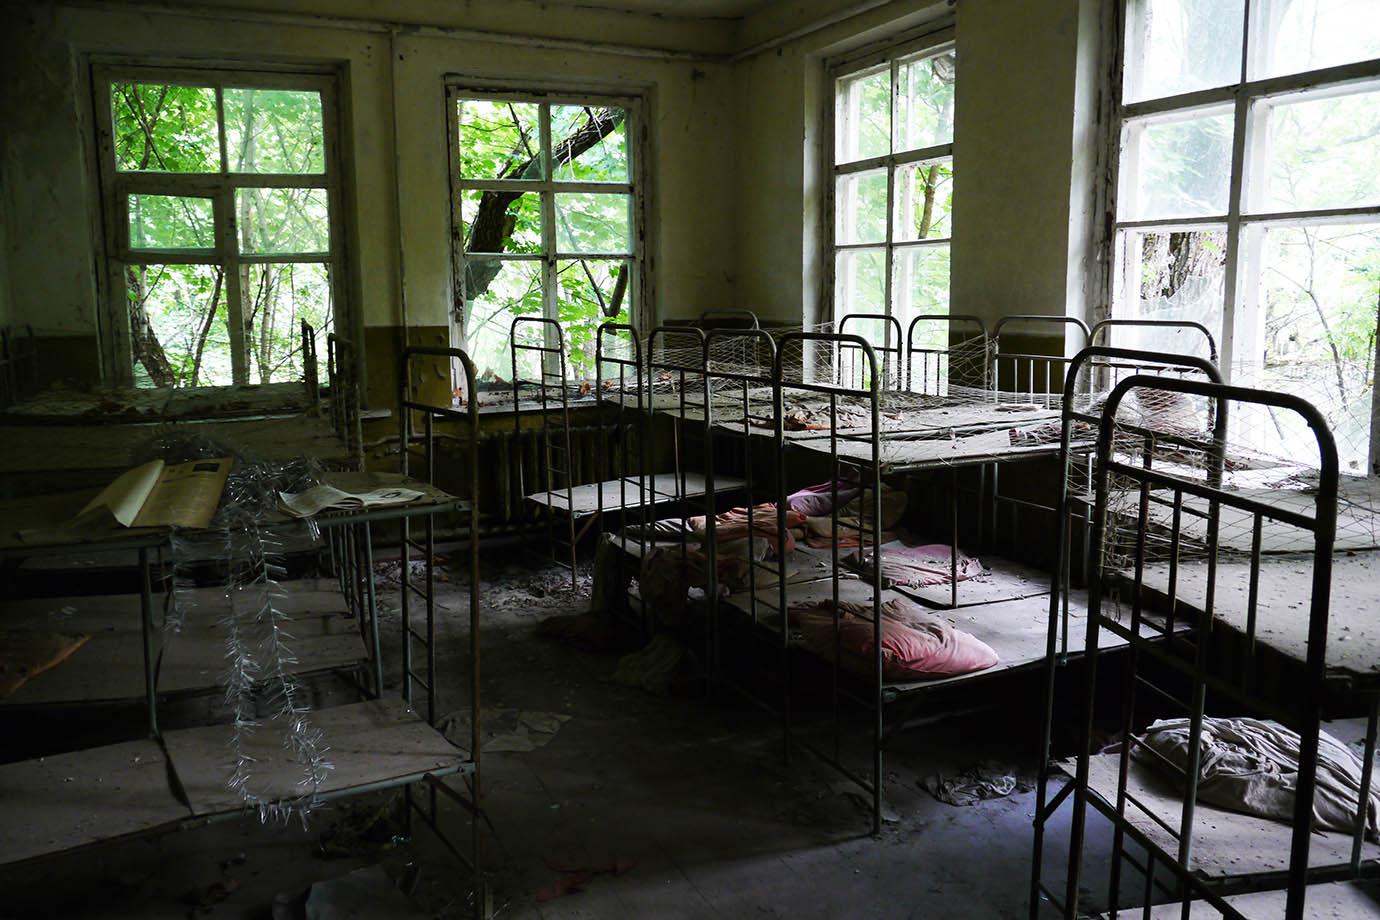 chernobyl-disaster13